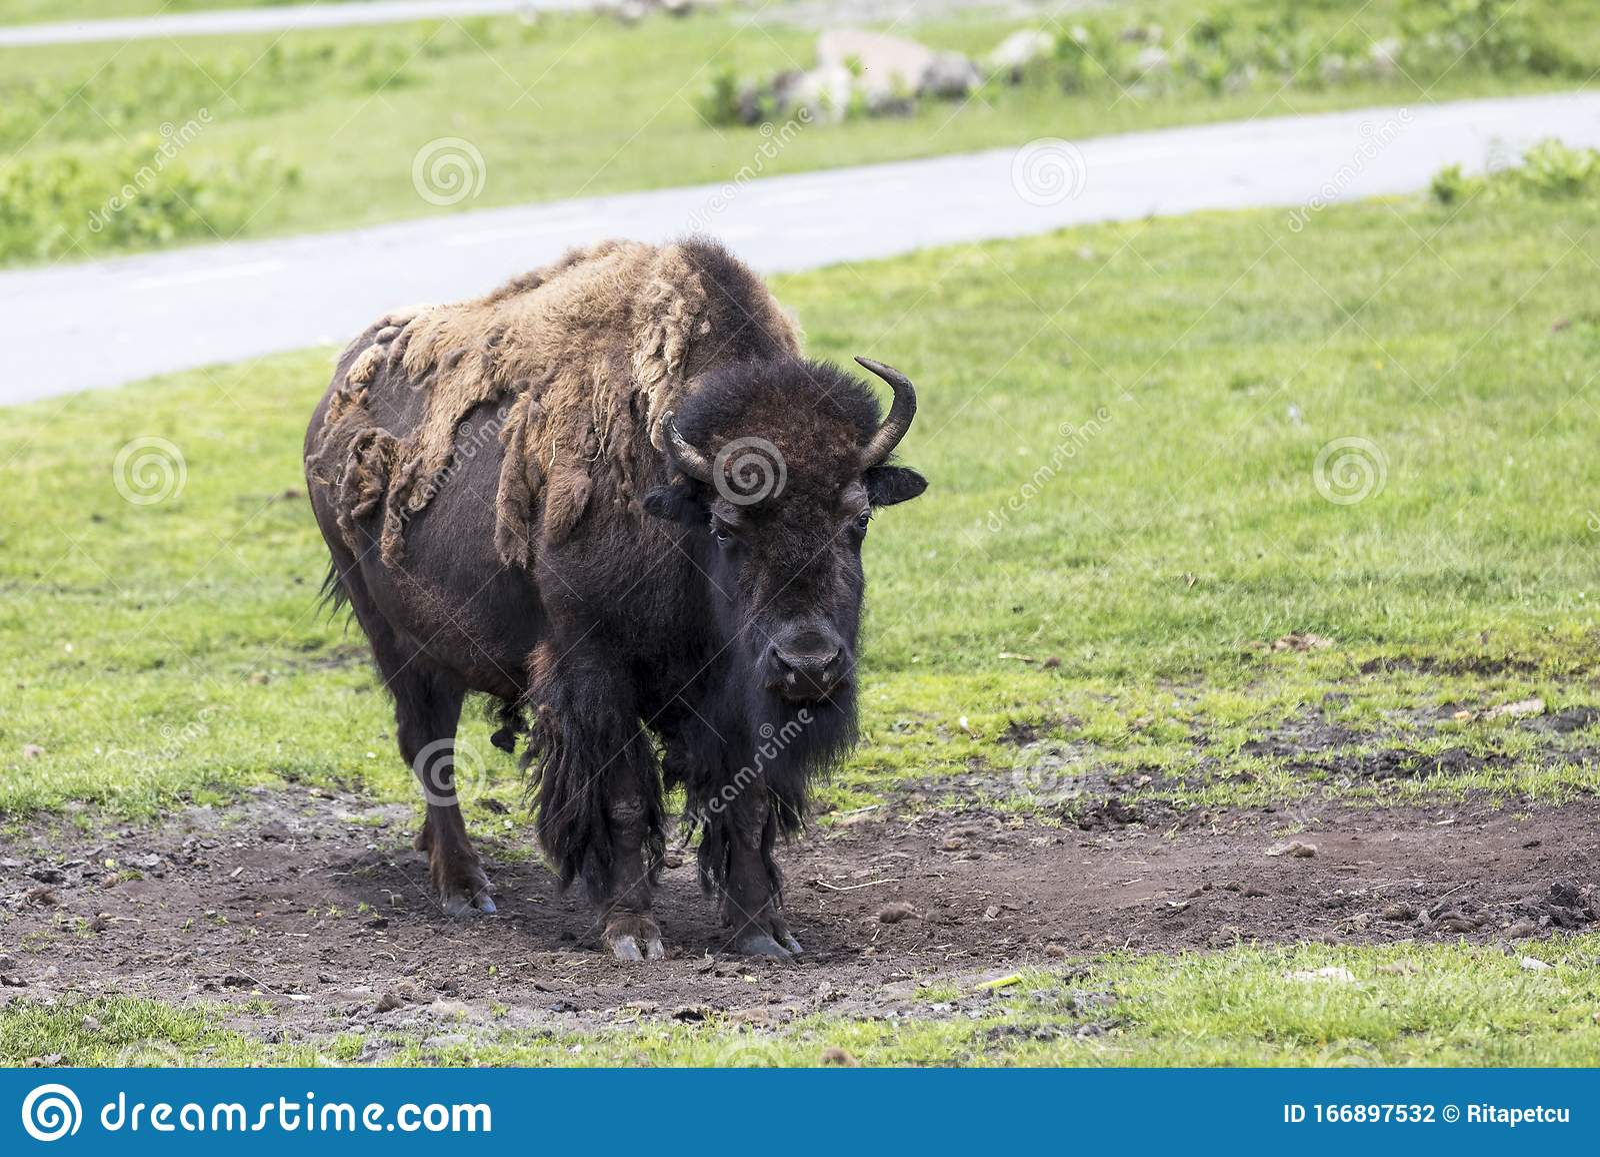 Western Whiskey Gazette (WWG): Buffalo Dierssenicus - Updates!